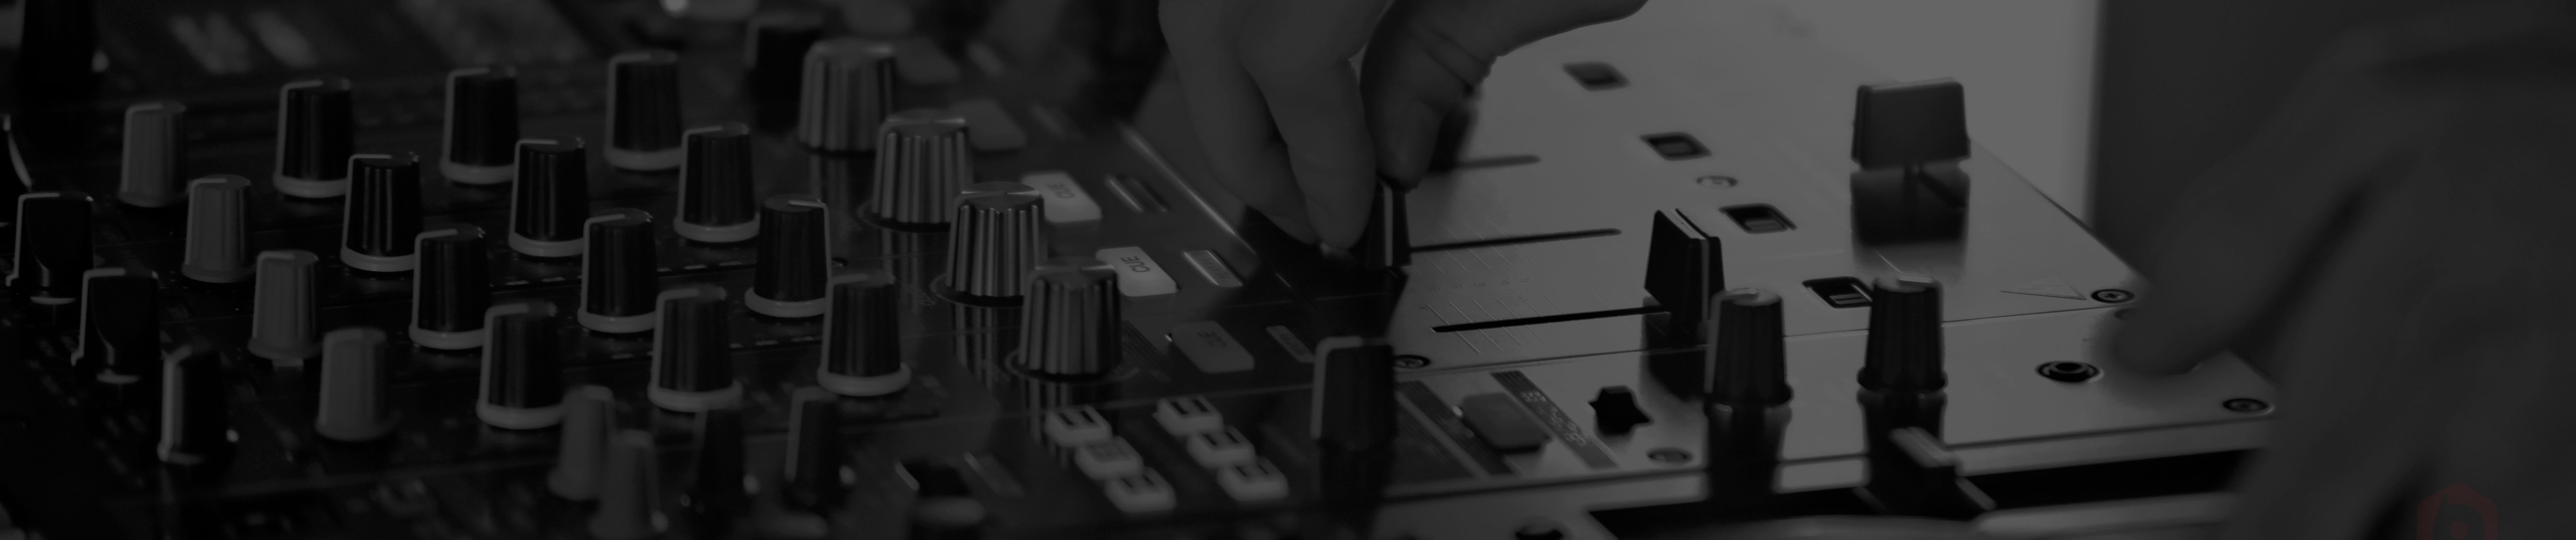 BPM SUPREME | Free Listening on SoundCloud